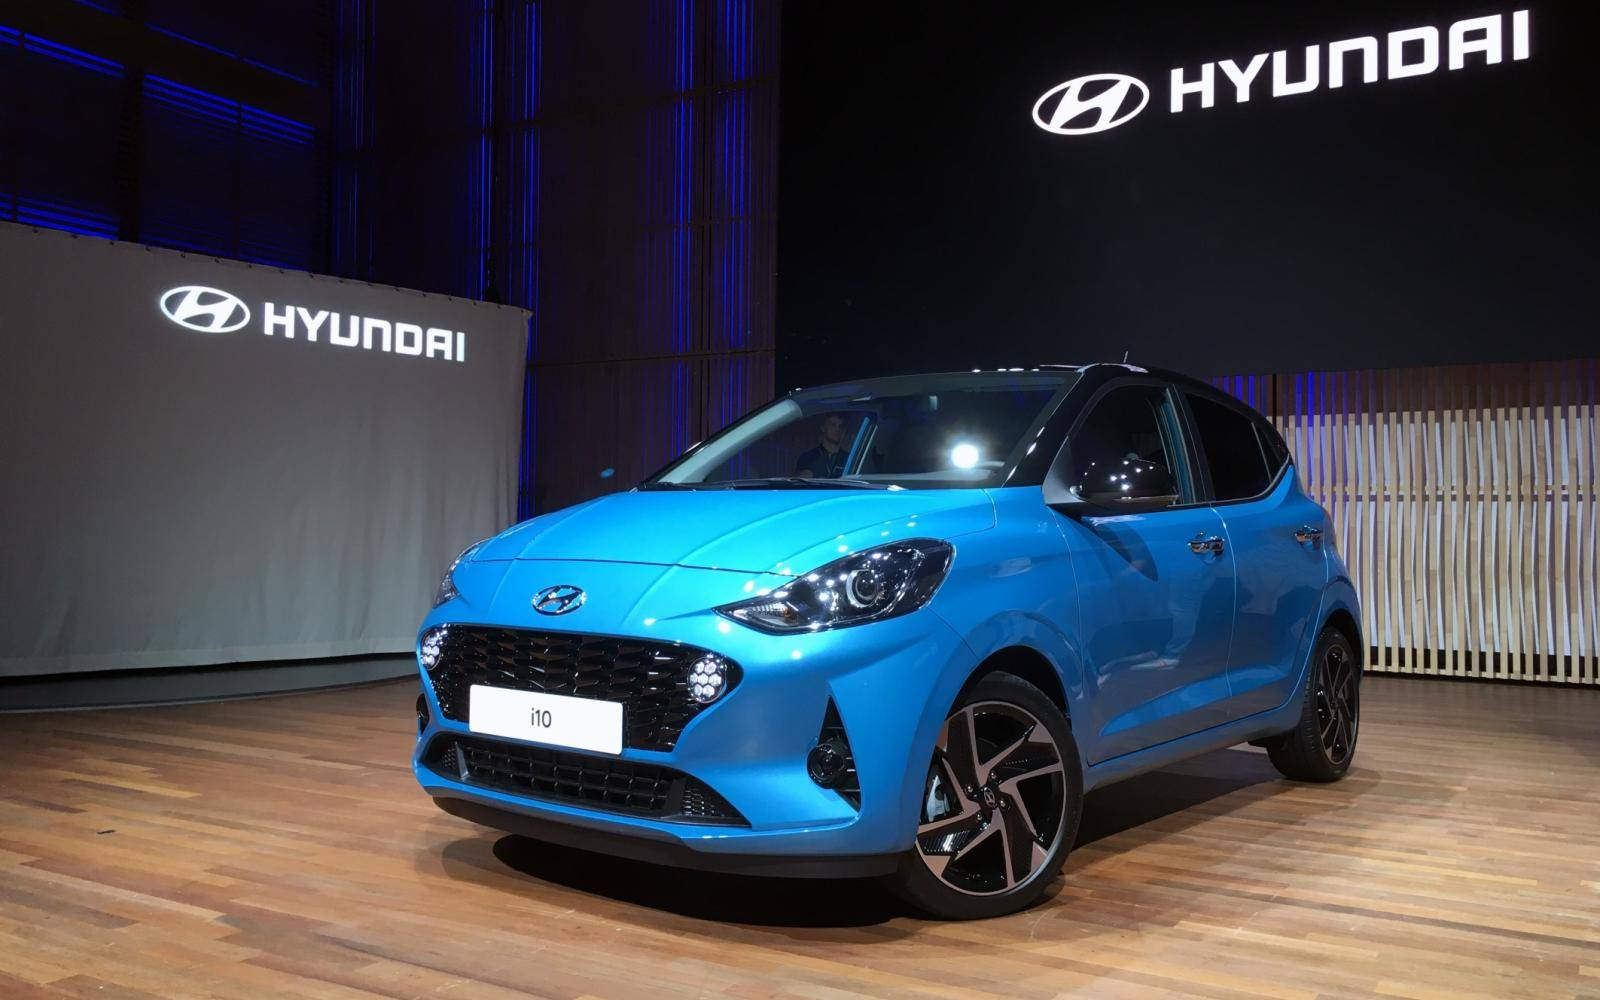 Nieuwe Hyundai i10 (2019): smoelt goed en verrassend ruim